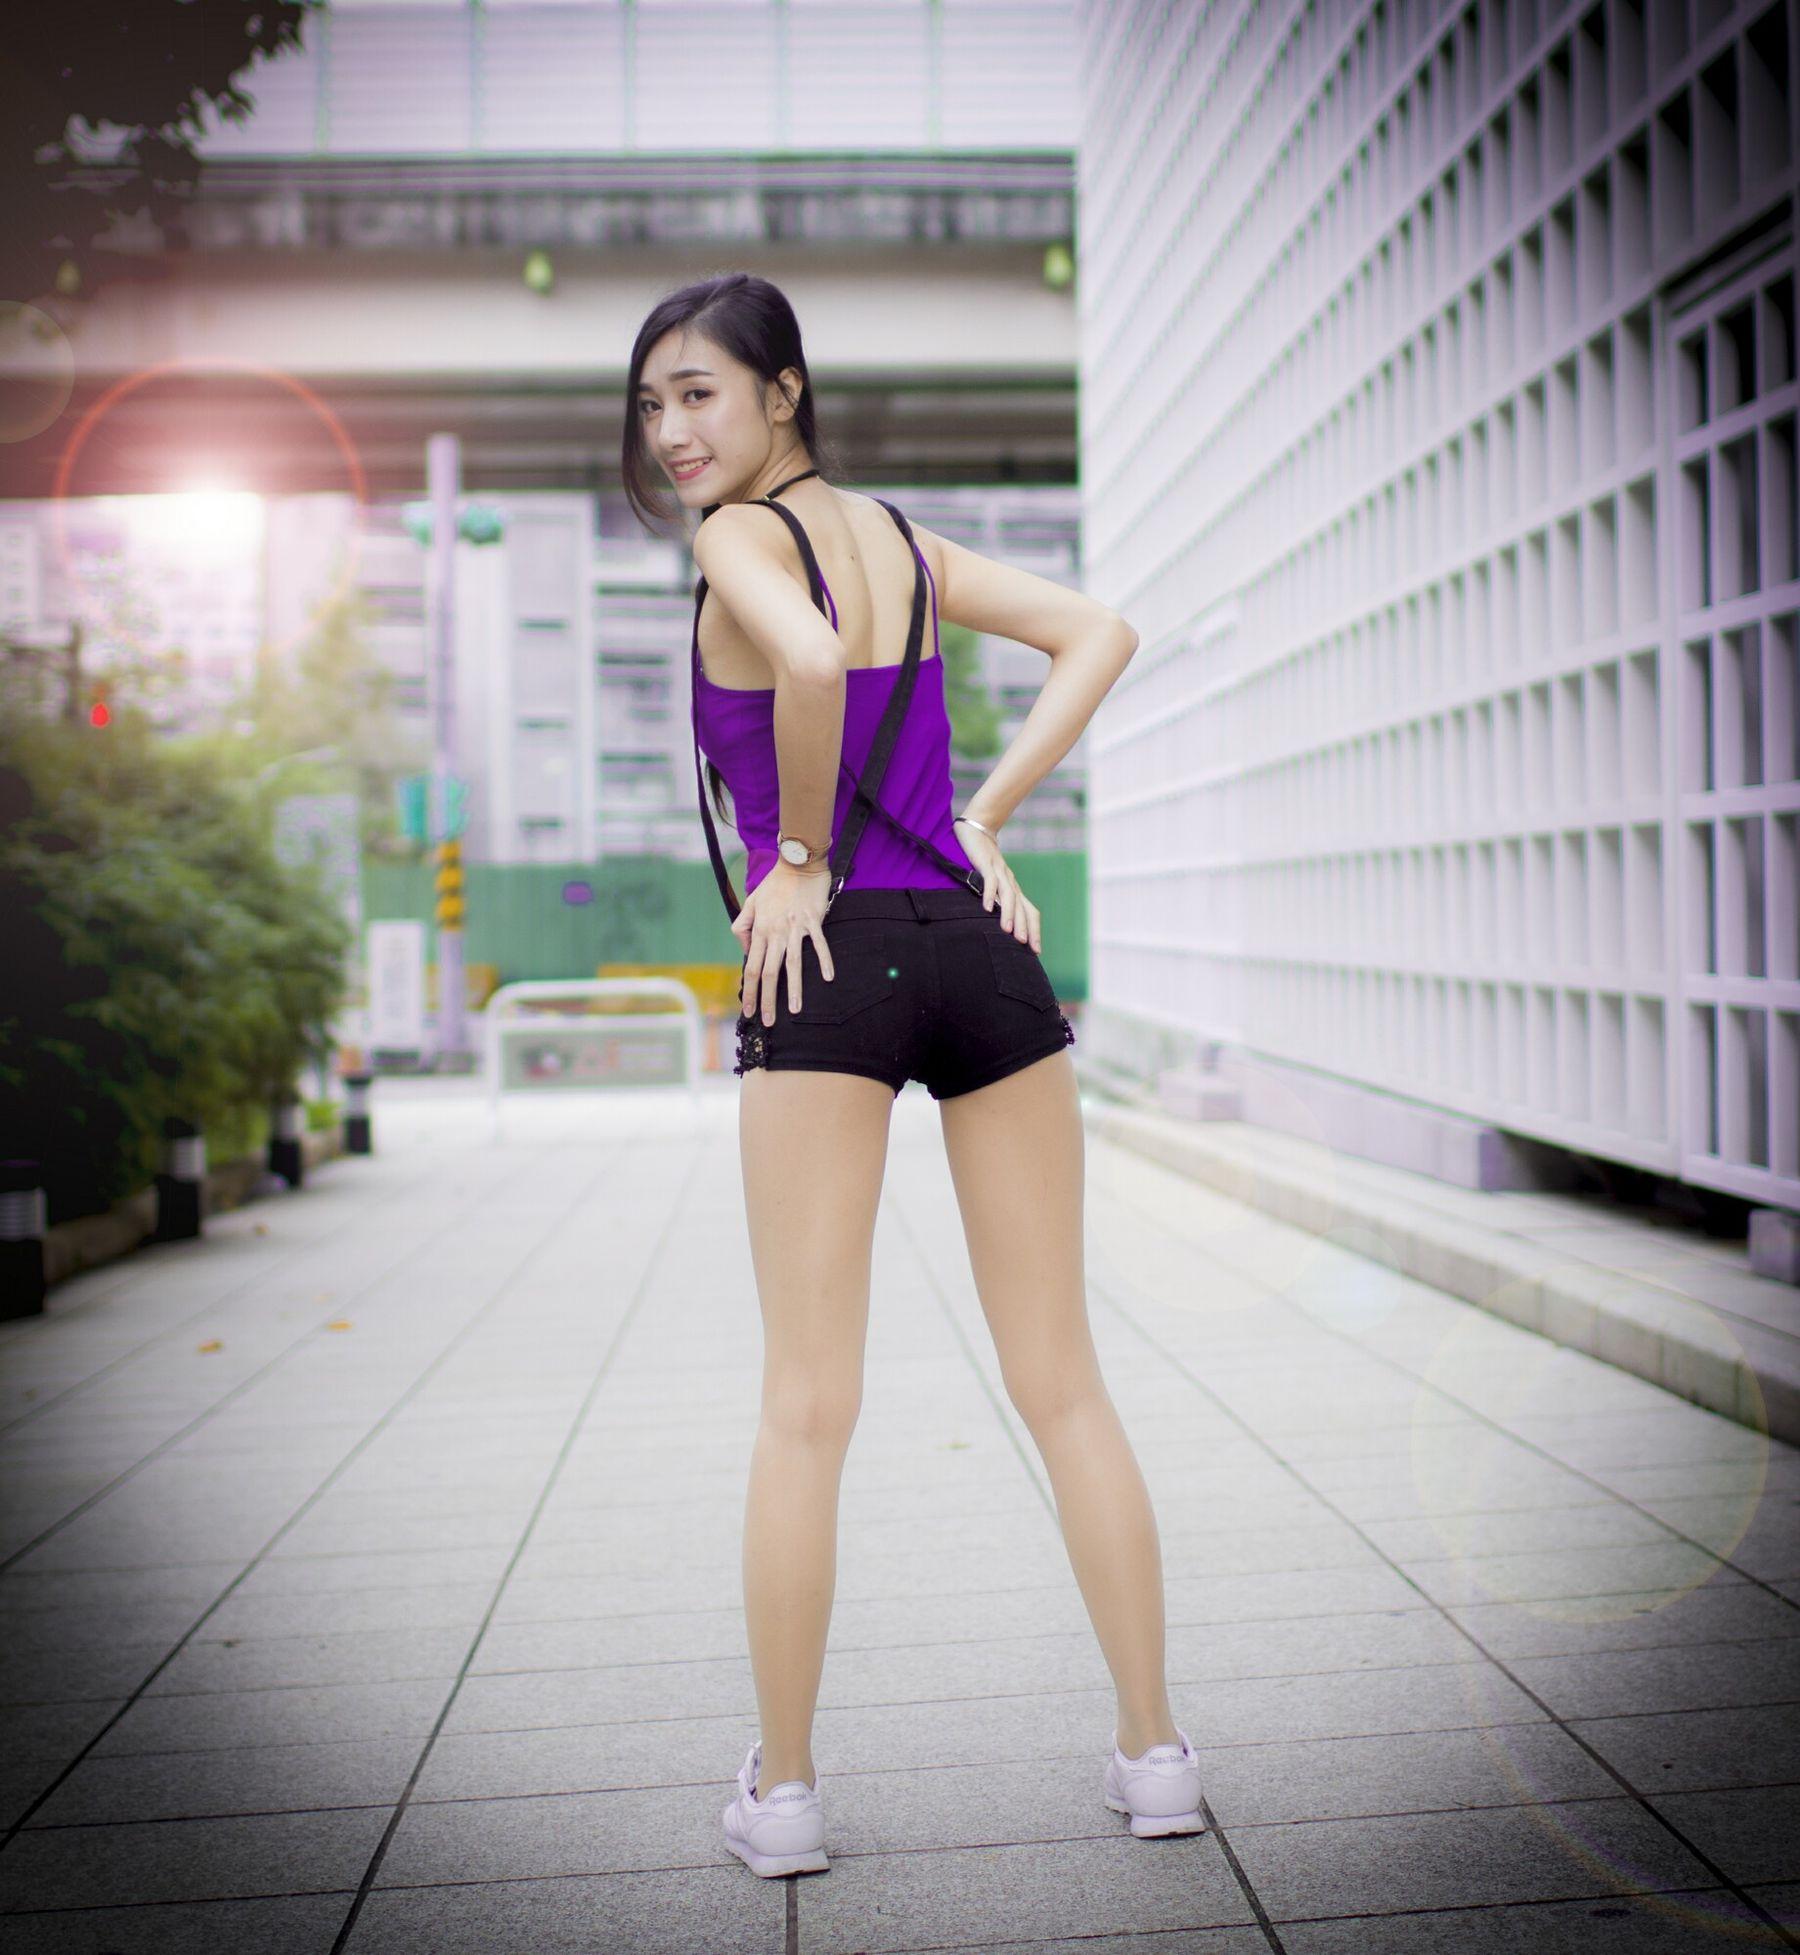 VOL.65 [台湾正妹]正妹长腿美女街拍美臀街拍美腿:段璟乐(段乐乐)超高清个人性感漂亮大图(32P)